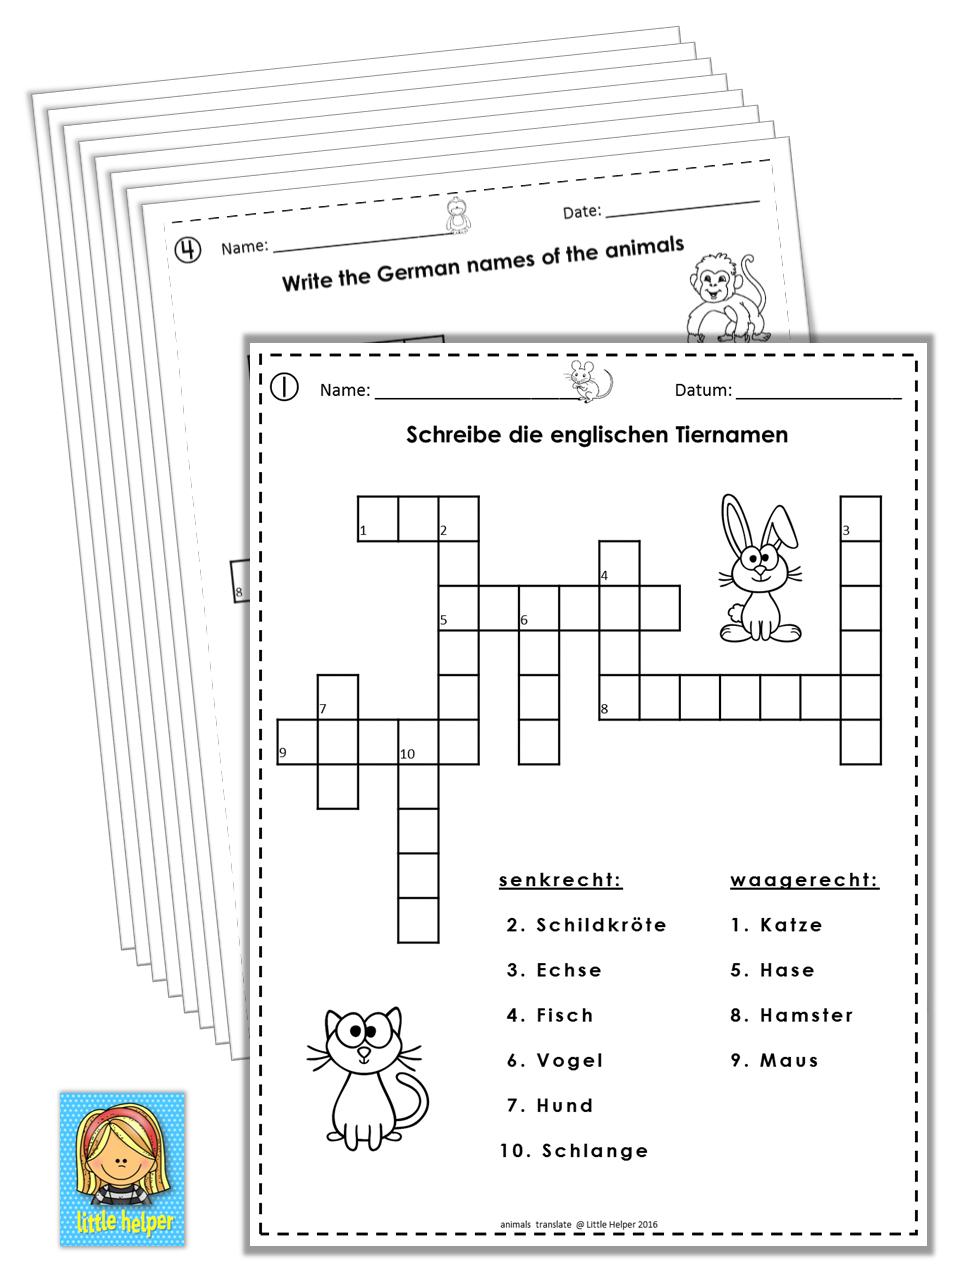 German/english Crossword Puzzles Tiere/animals | German Words - Printable German Crosswords